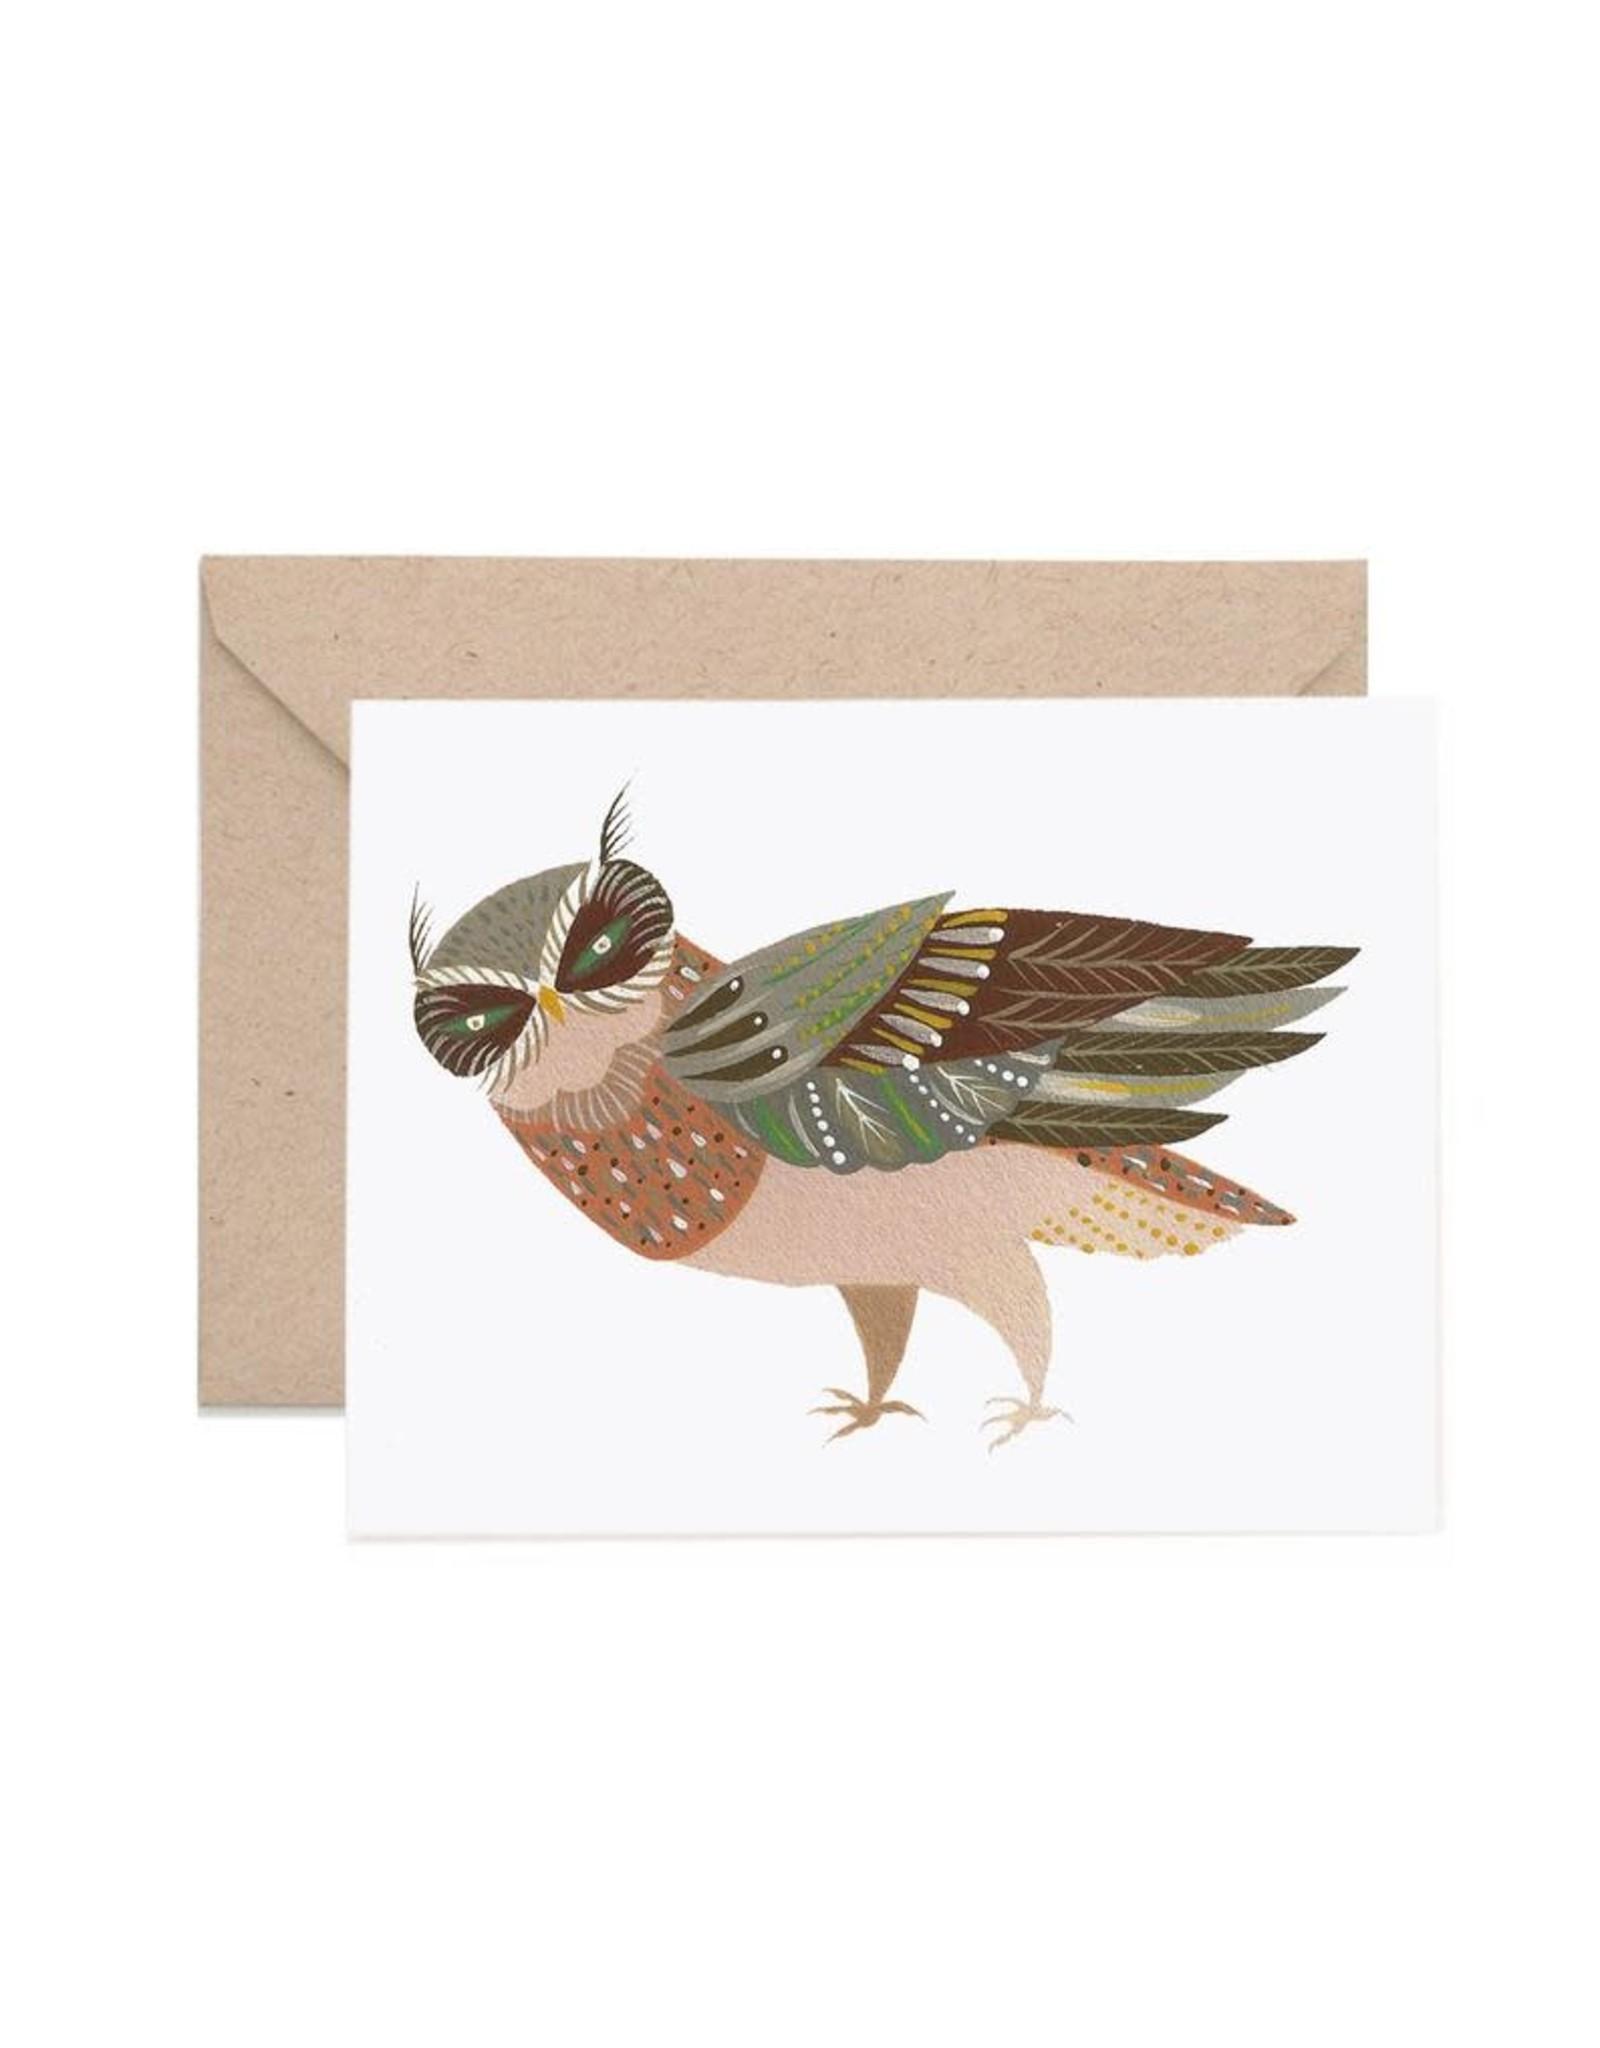 Lisa Vanin Notecard, Owl